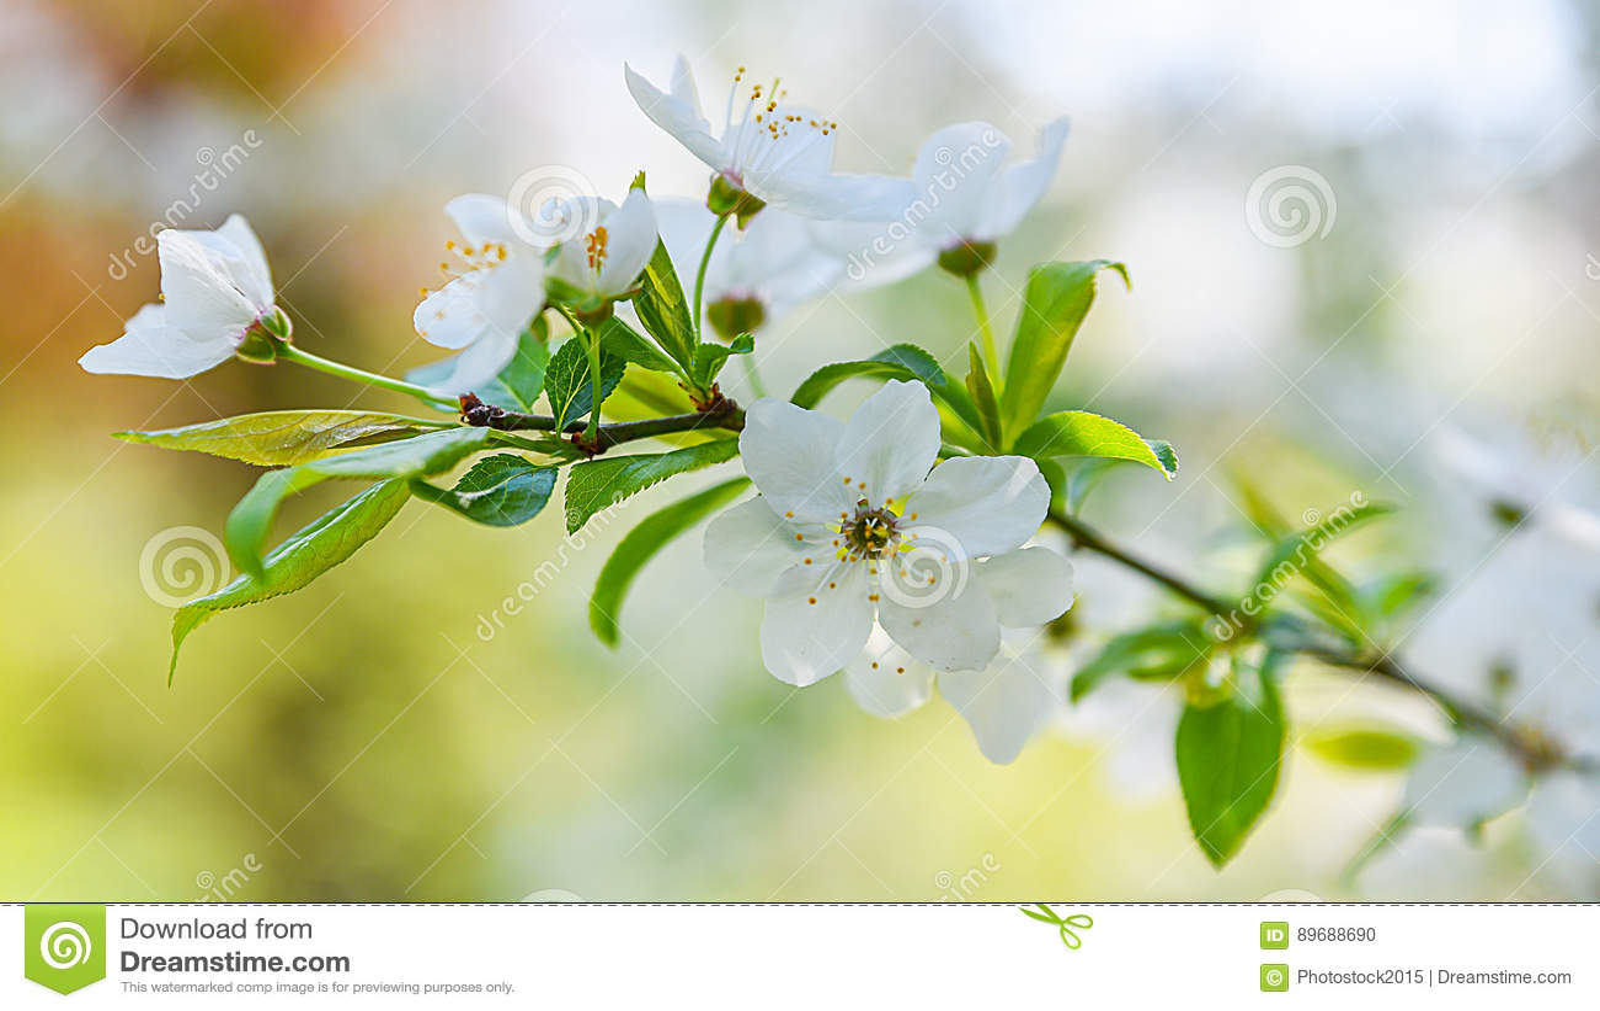 Seasonal Spring Flowers Trees Background Stock Photo Image Of Blue